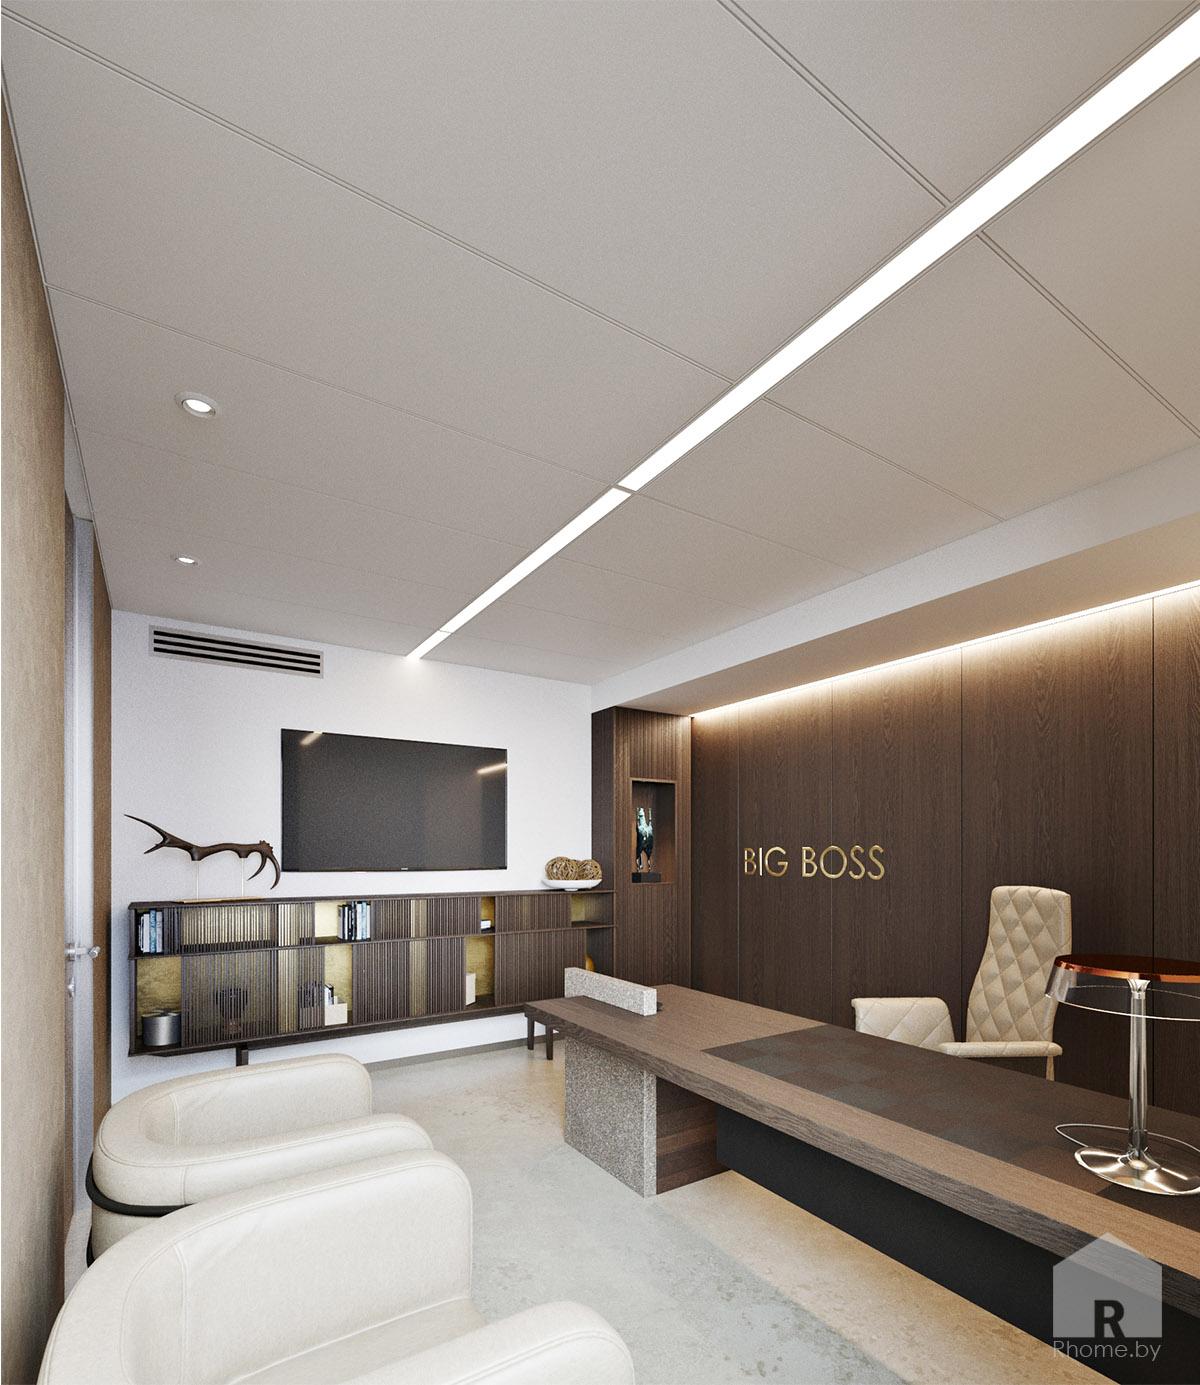 Дизайн интерьера кабинета директора | Дизайн студия – Rhome.by